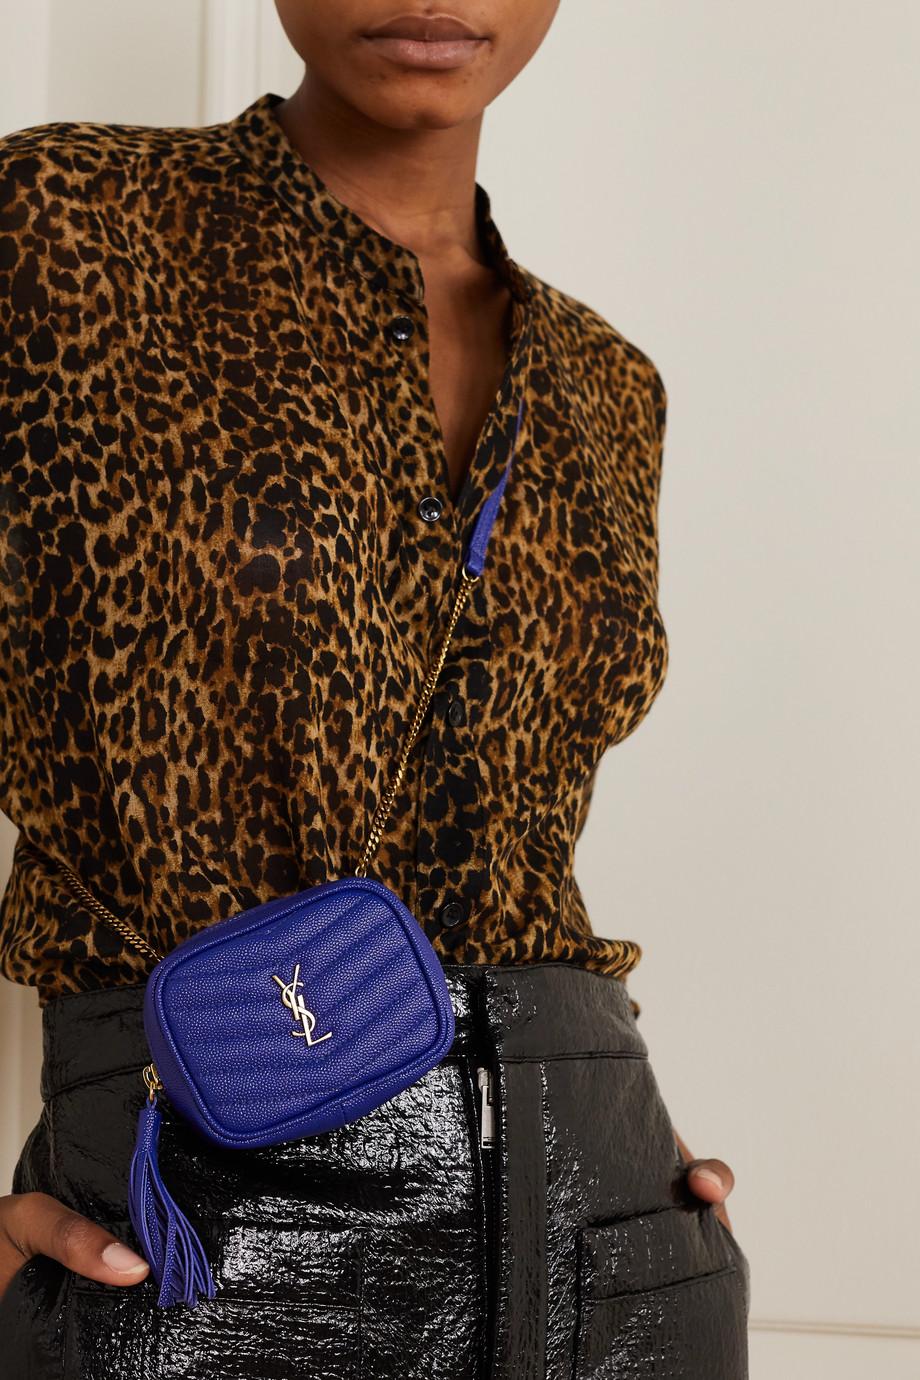 SAINT LAURENT Lou Baby gesteppte Schultertasche aus strukturiertem Leder